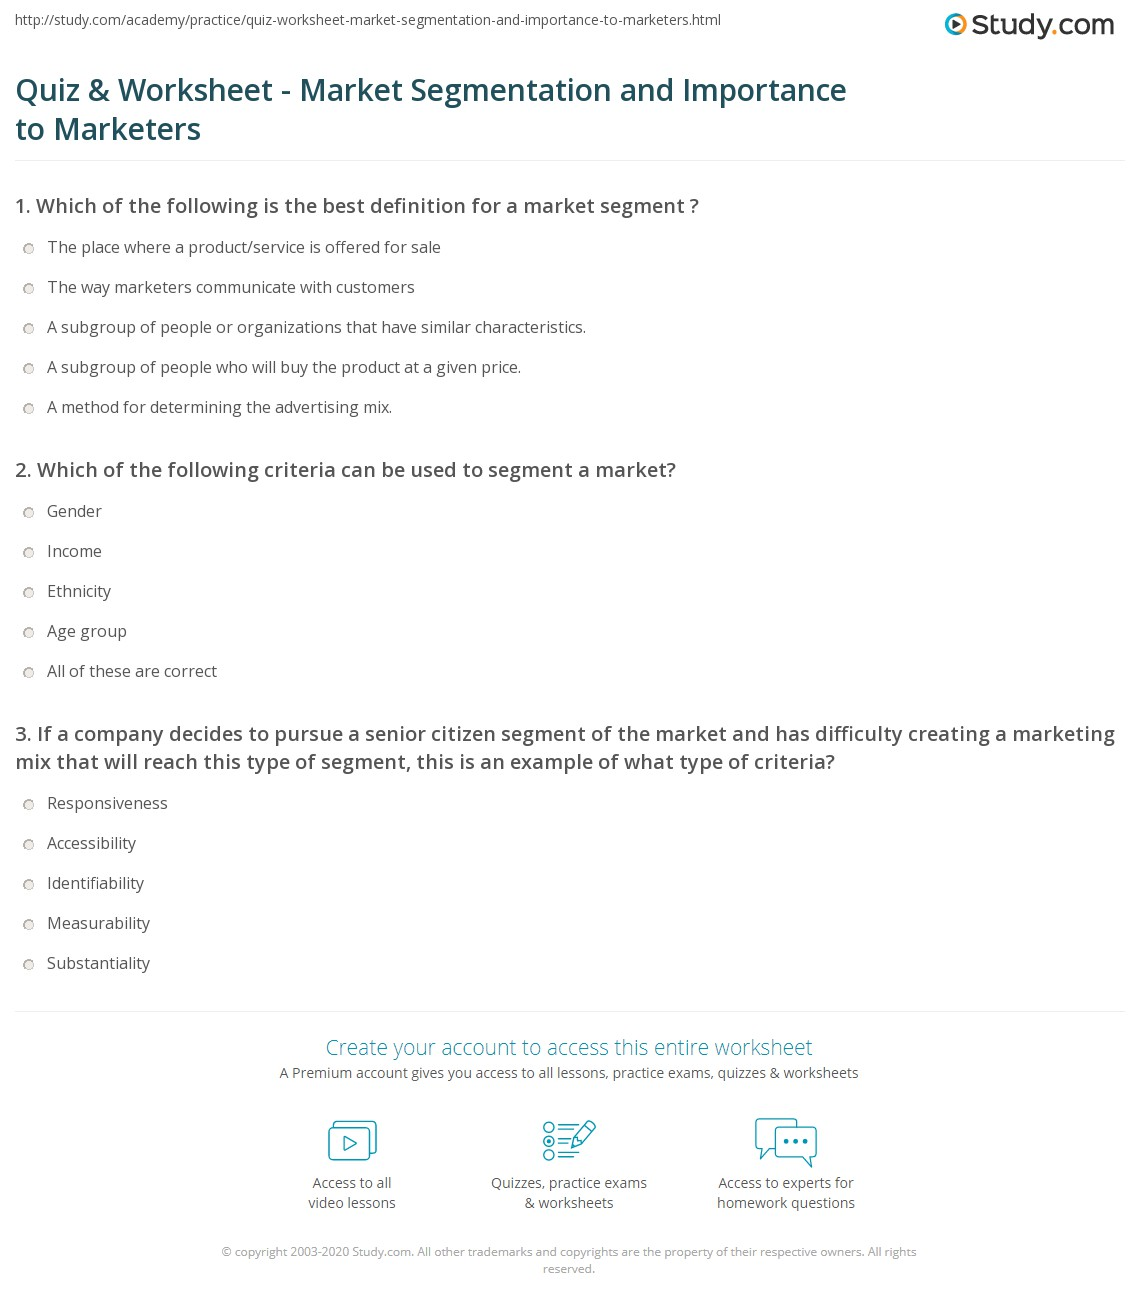 math worksheet : quiz  worksheet  market segmentation and importance to marketers  : Market Math Worksheets